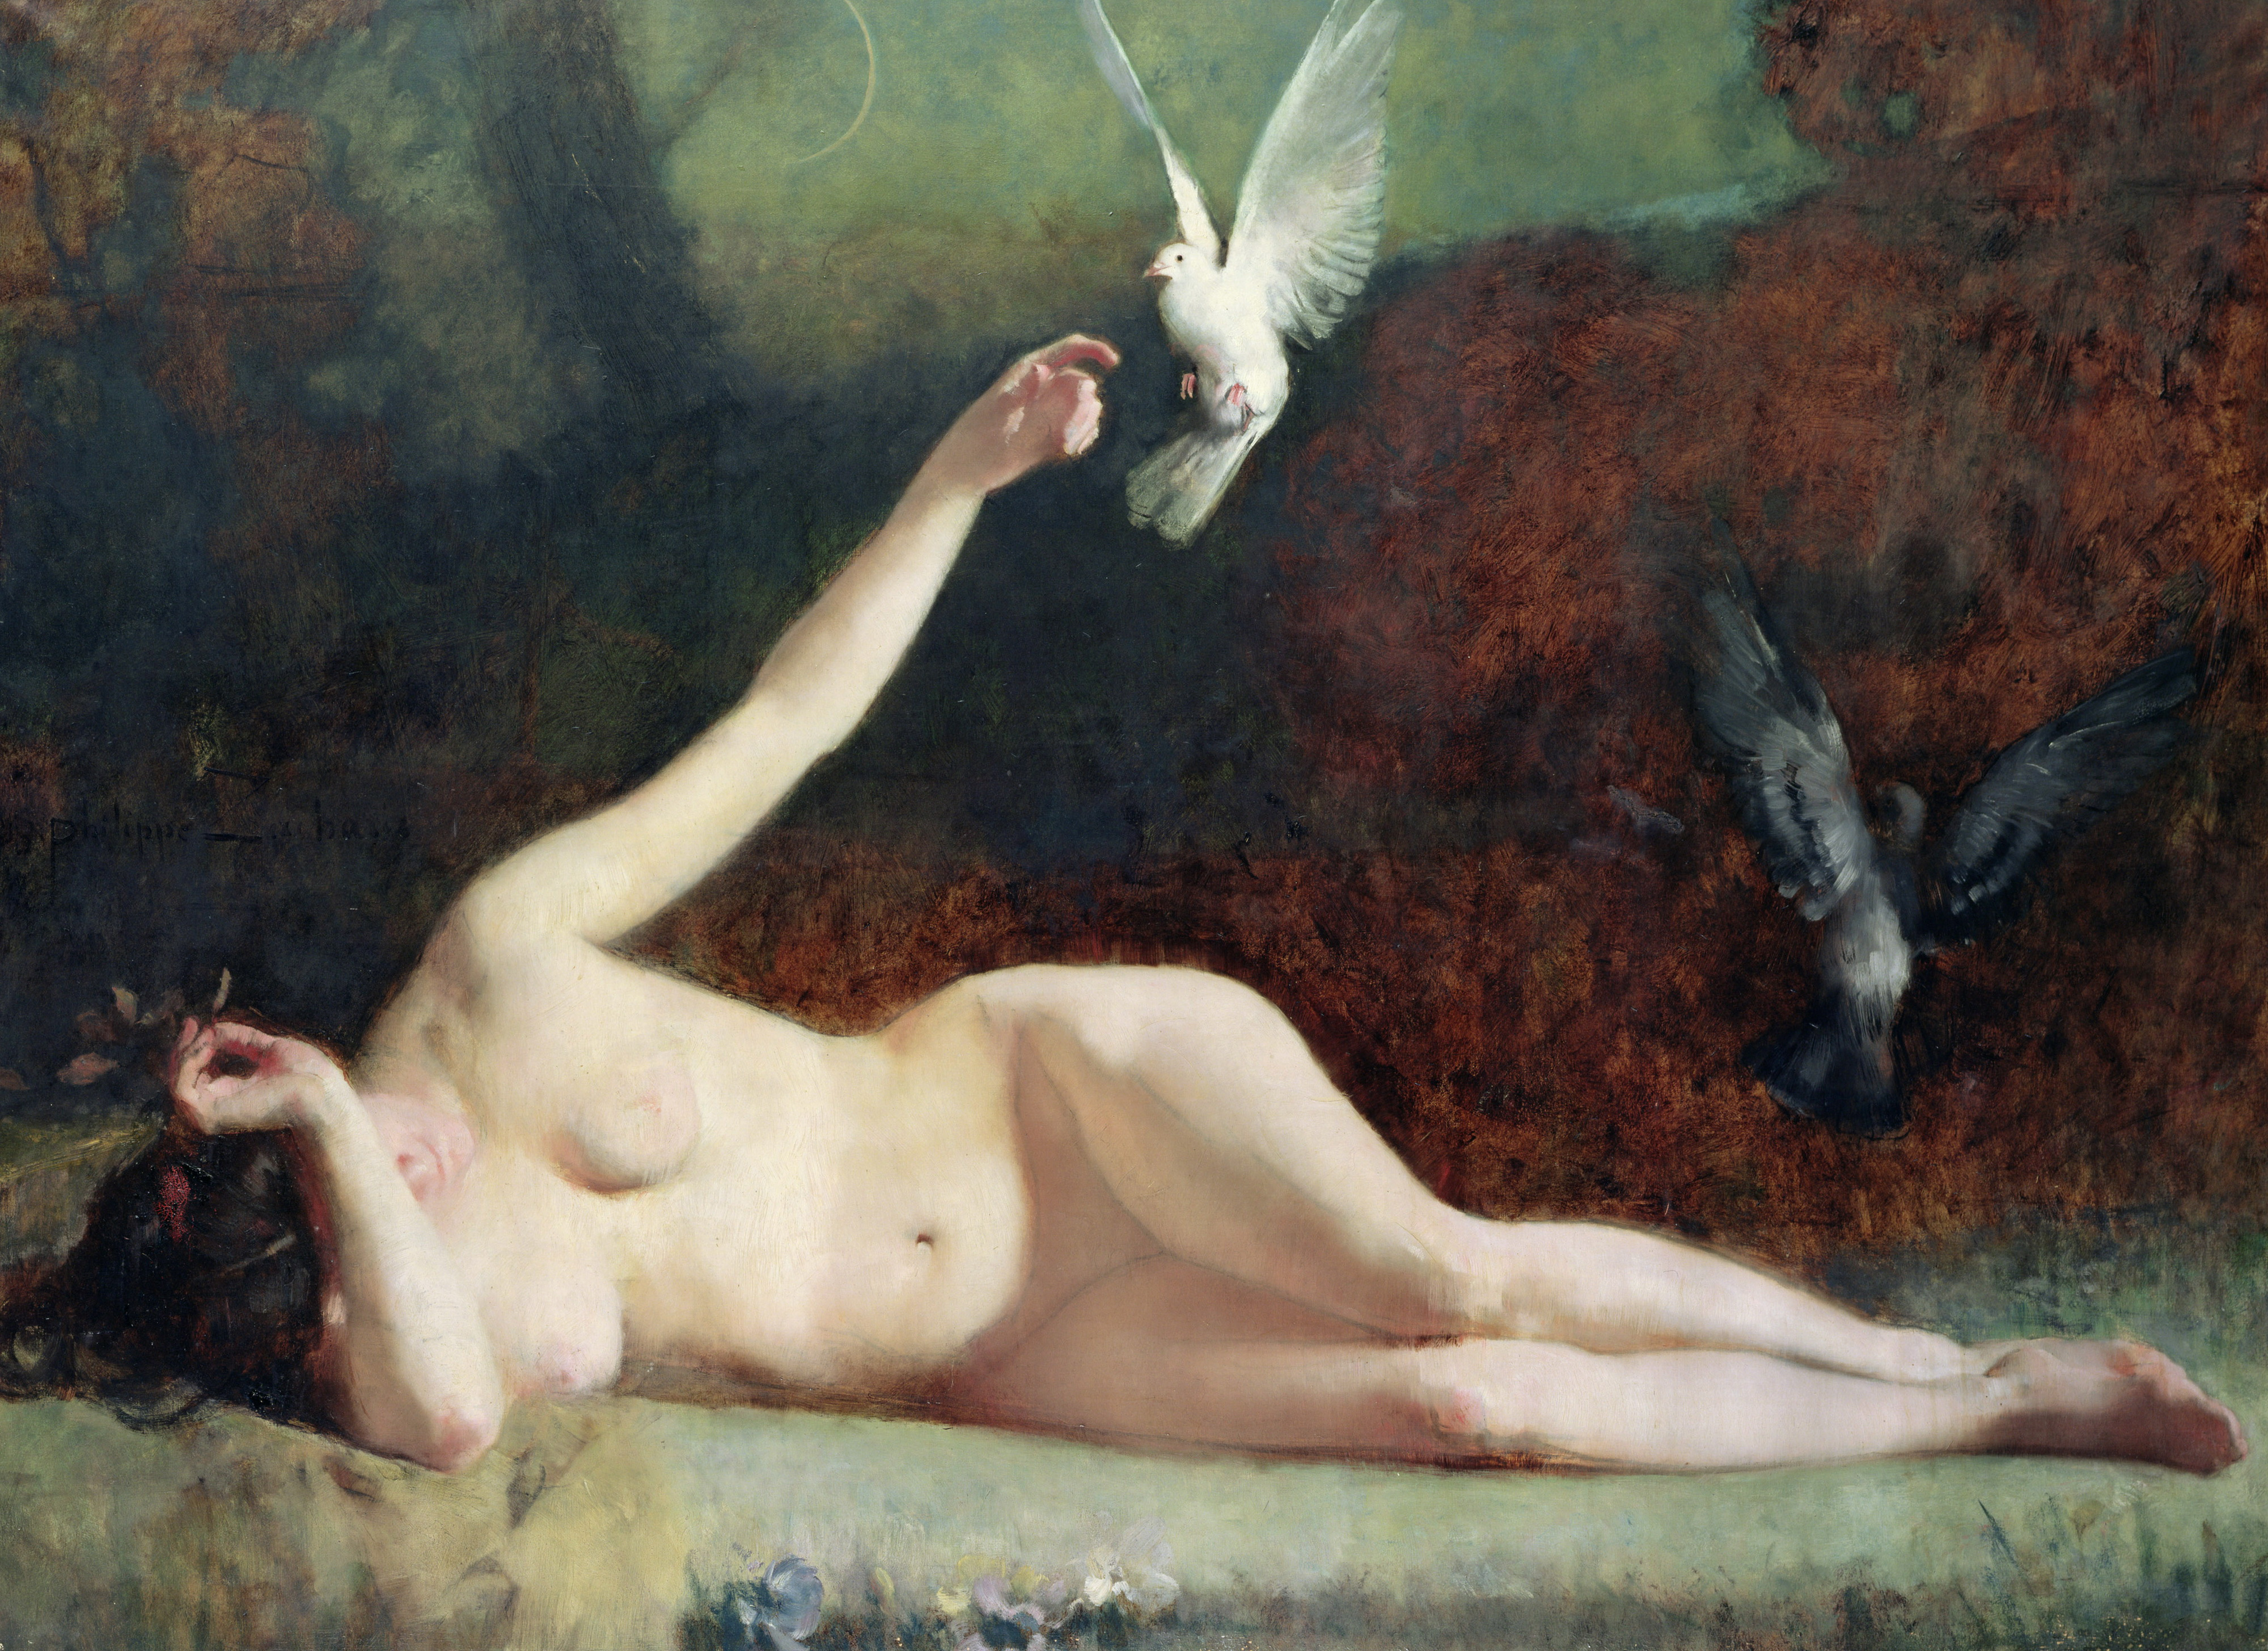 Philippe-Ernest Zacharie, 1849-1915. Женщина с голубями. ок.1883. Руан, Музей изобр. искусств